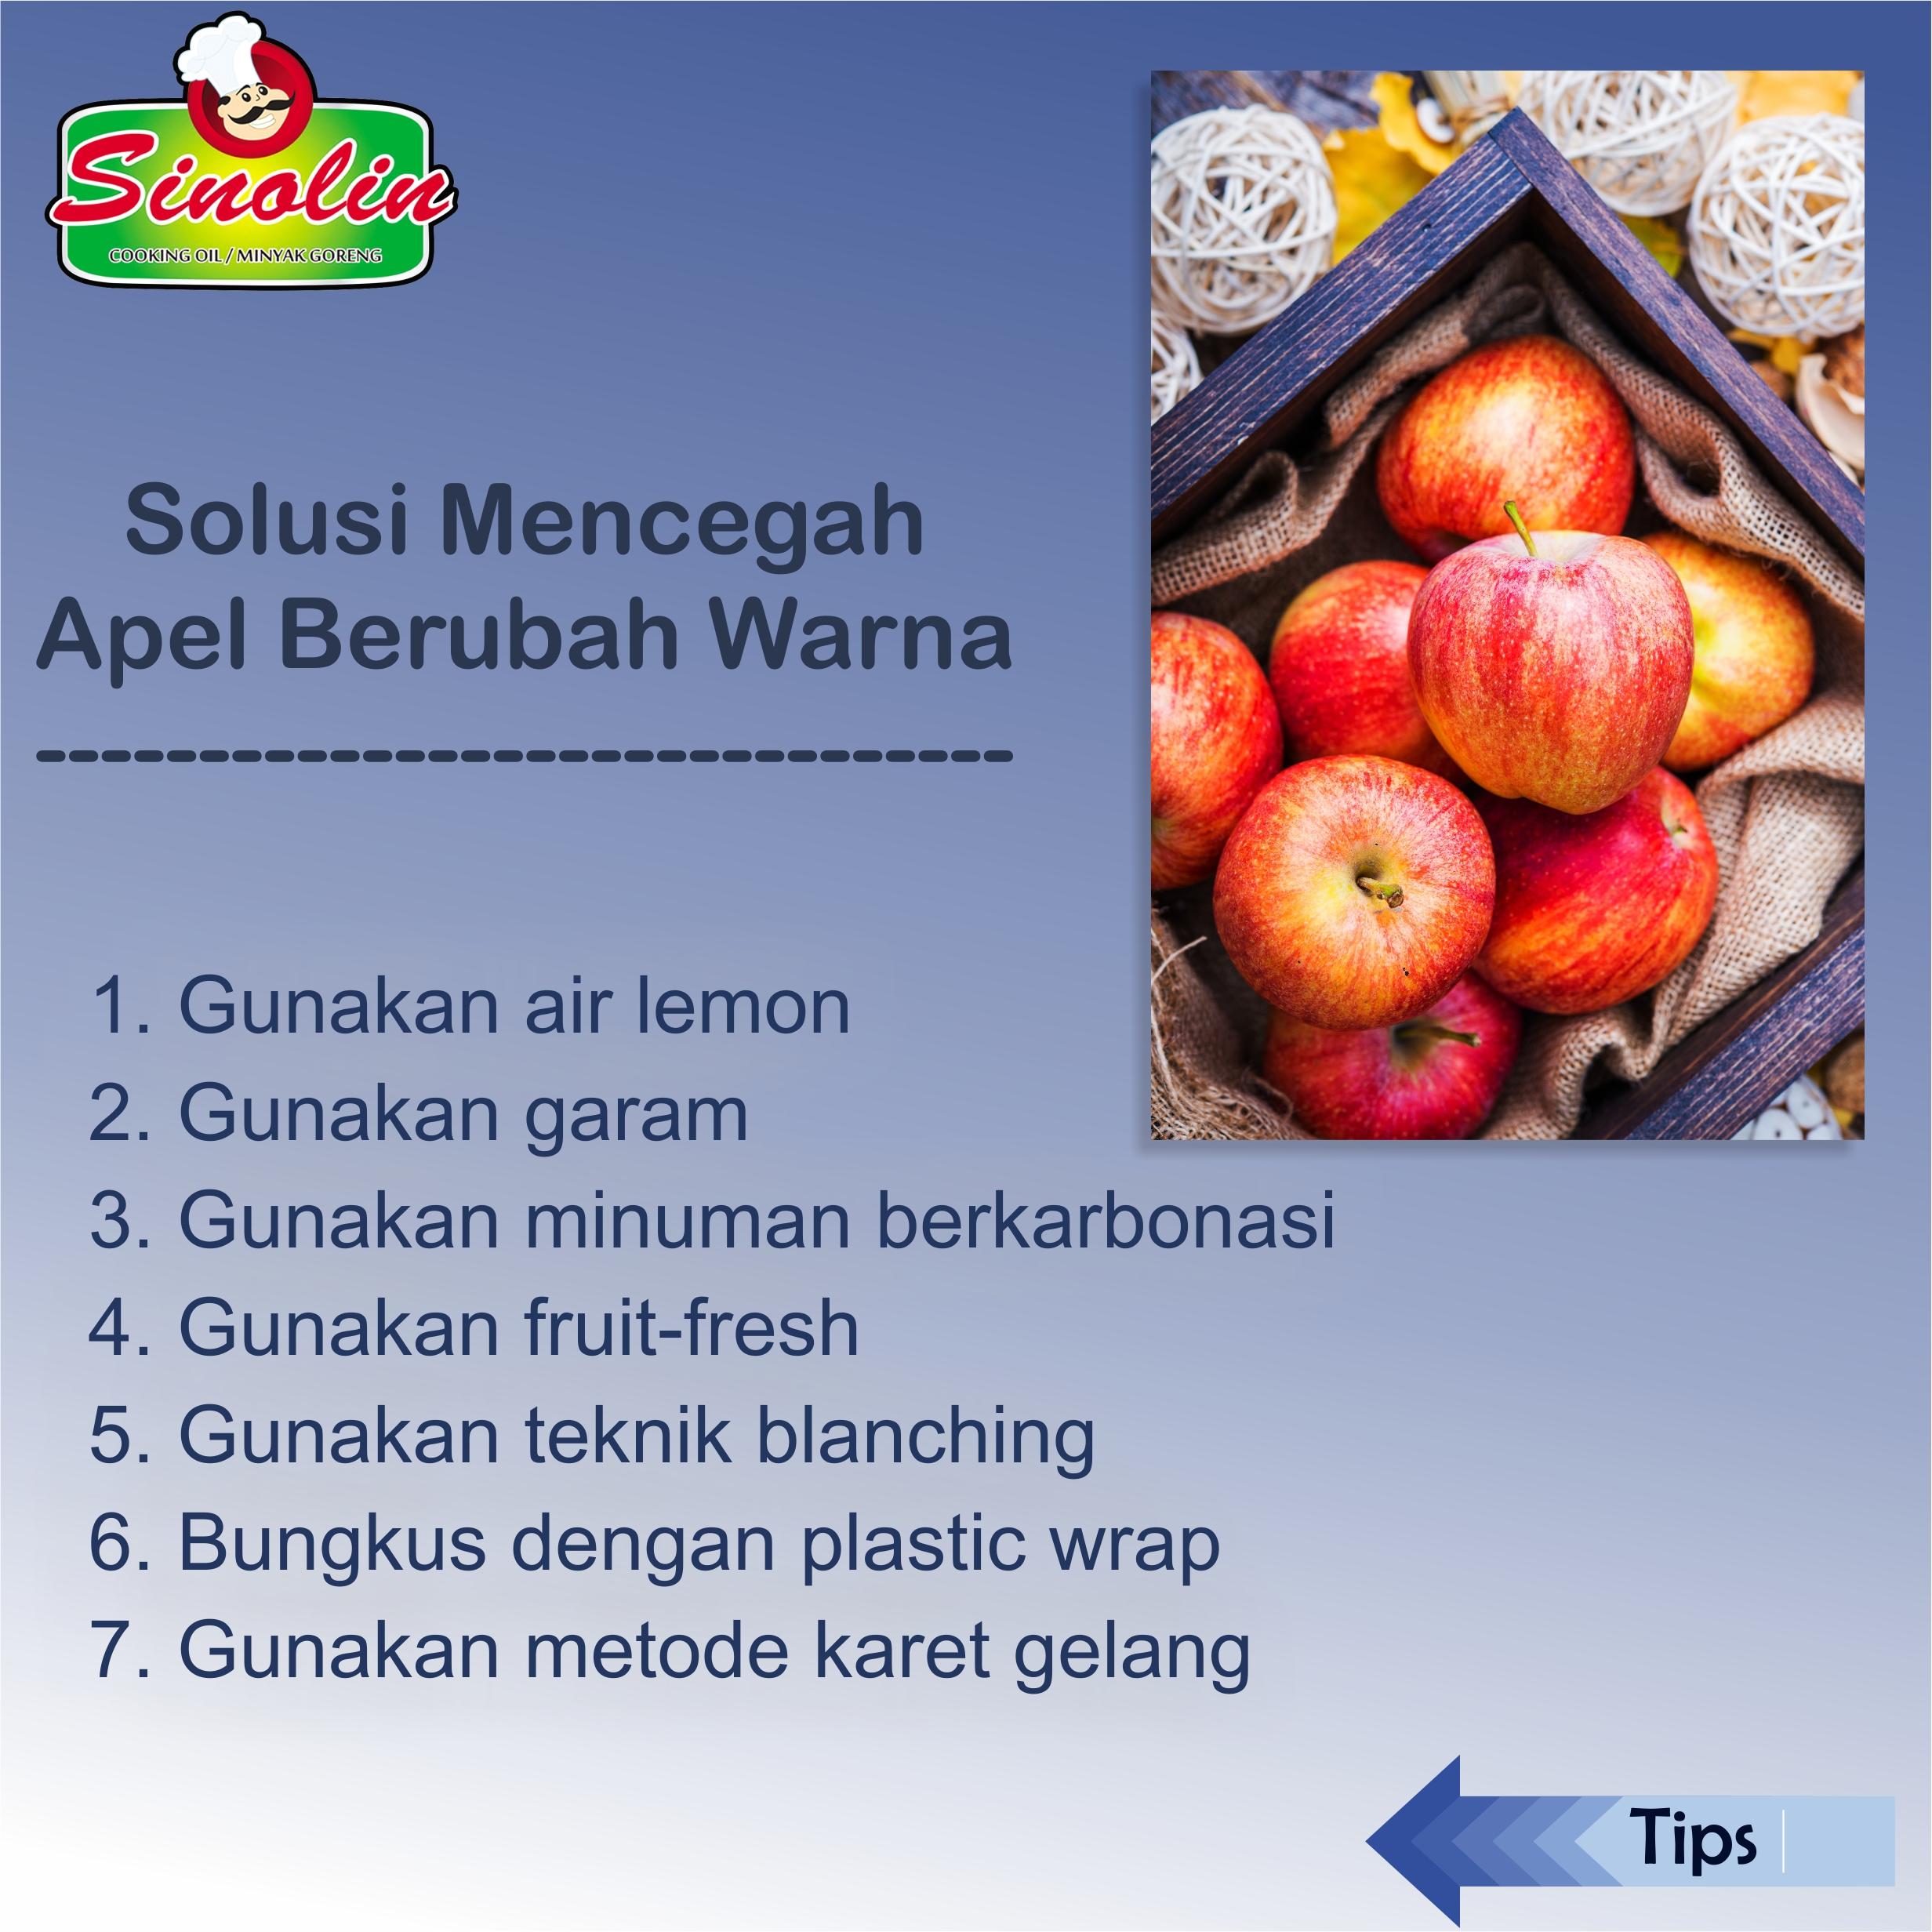 Solusi Mencegah Apel Berubah Warna oleh Dapur Sinolin